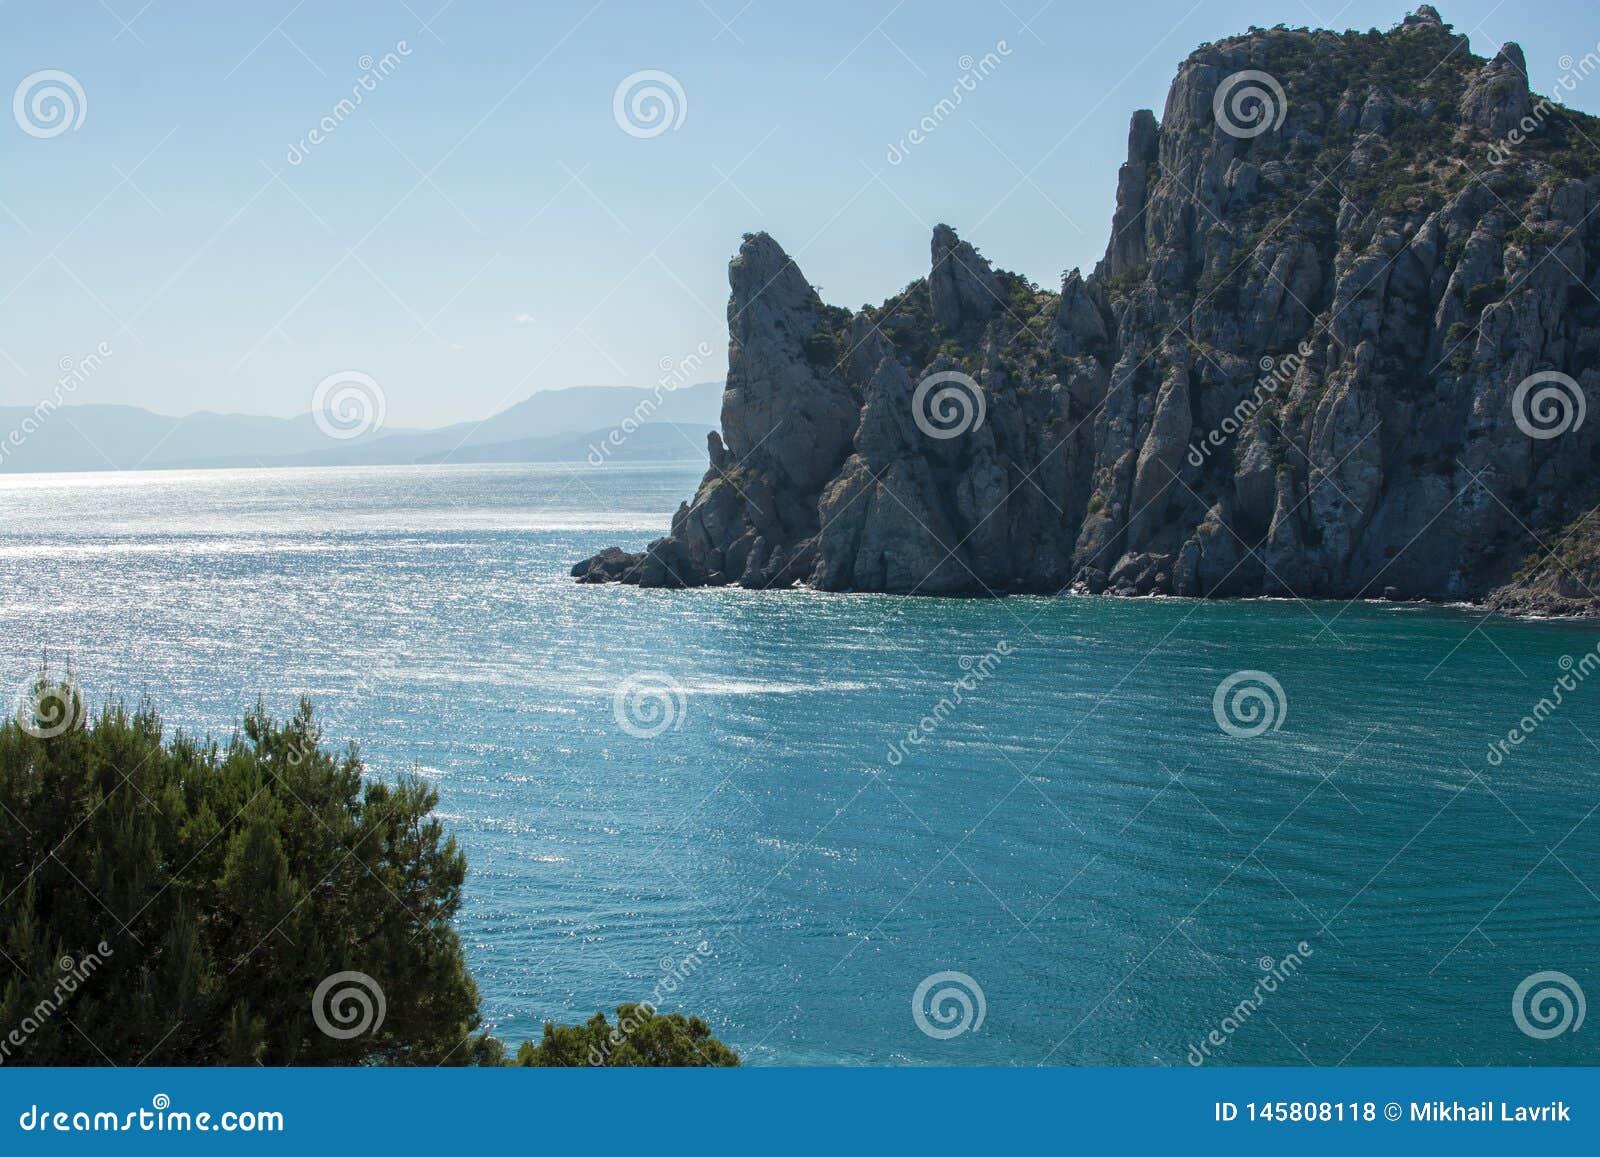 Summer in Crimea. Rock and sea.